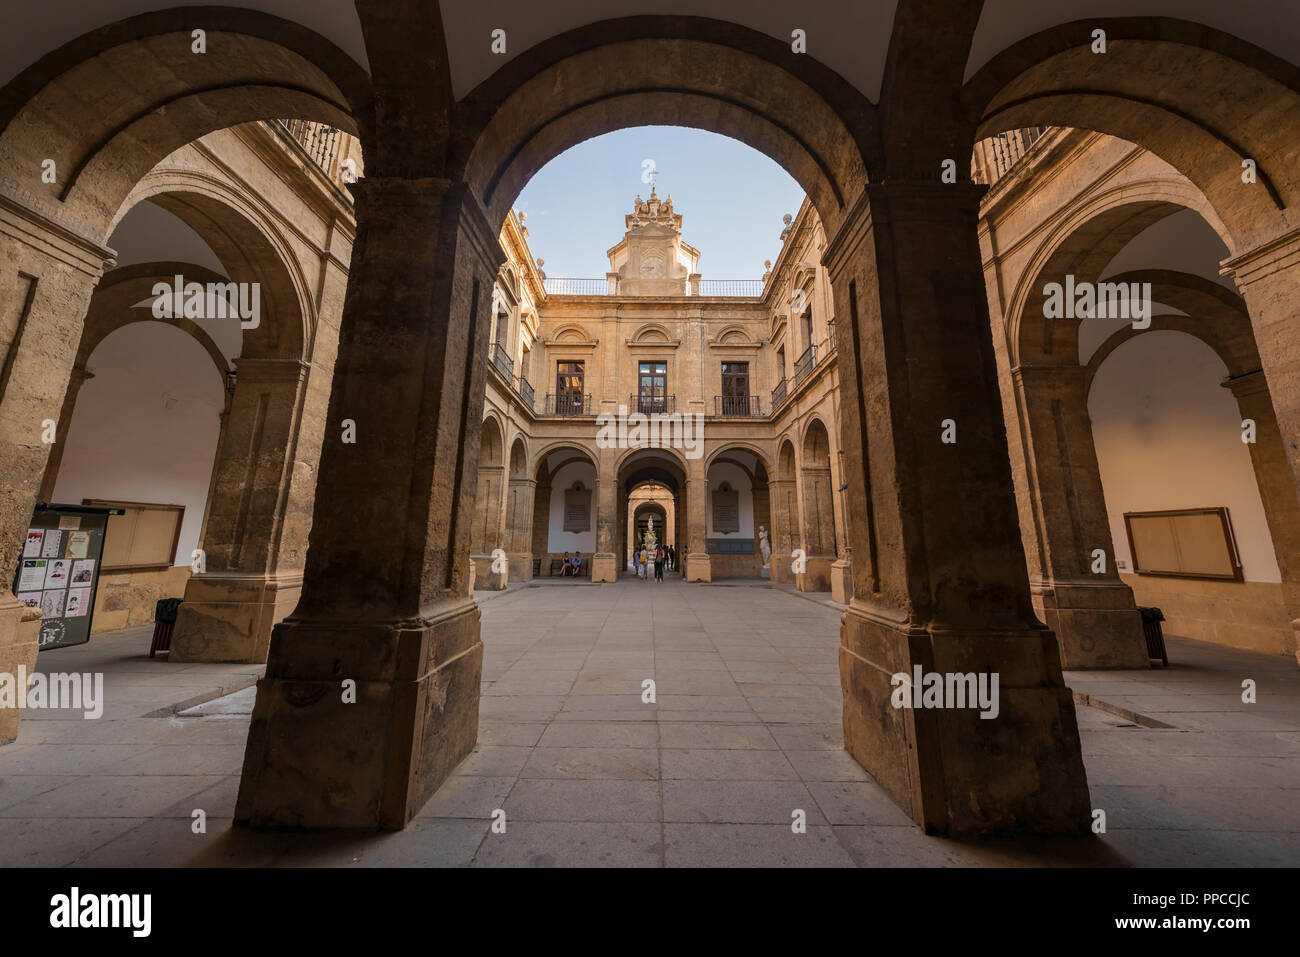 Neo-classical courtyard with arcade, University, former Royal Tobacco Factory, Real Fábrica De Tabacos de Sevilla, Seville - Stock Image